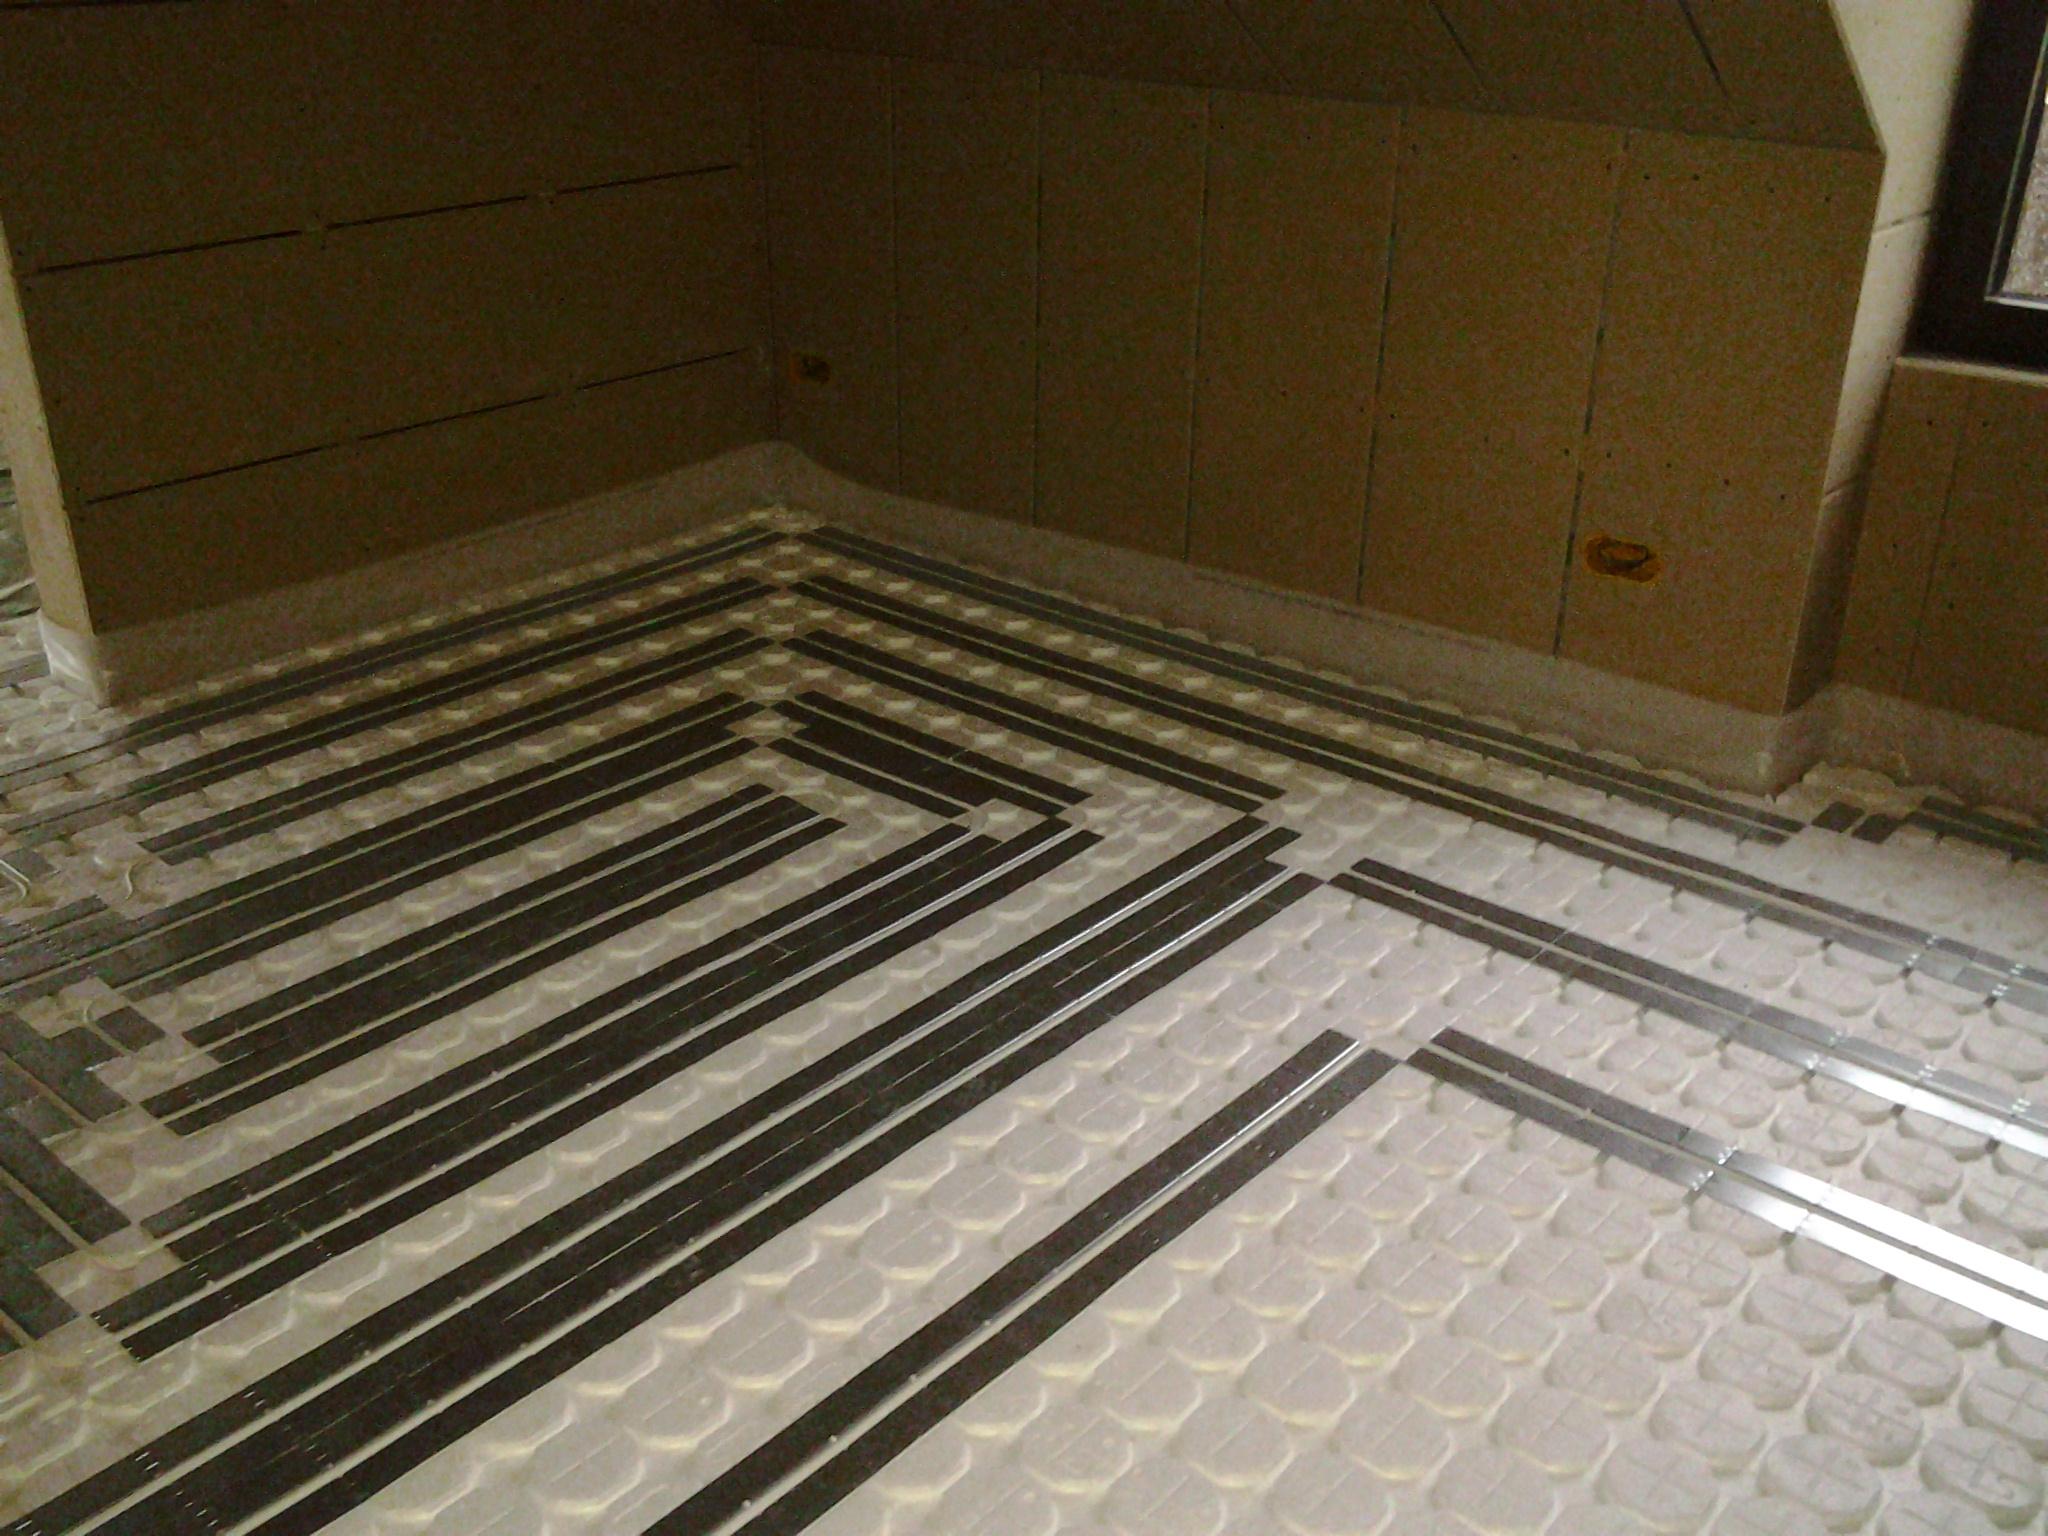 ga l pirlot chauffage plomberie et sanitaire ciney installation de chauffage. Black Bedroom Furniture Sets. Home Design Ideas